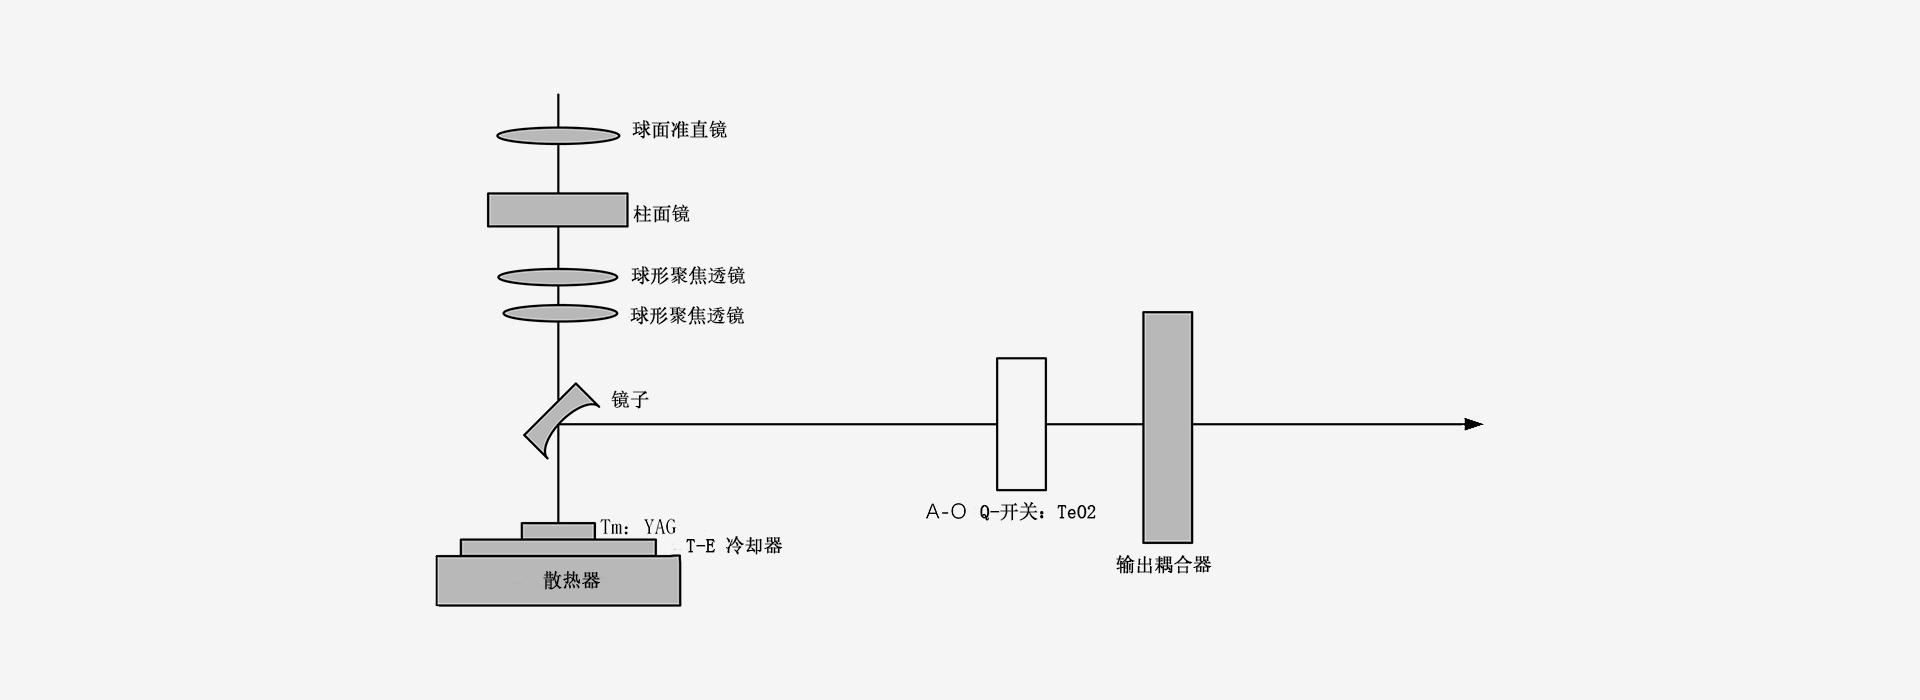 2000nm(TmYAG)-激光器原理图-南京光宝-CRYLINK -原理图